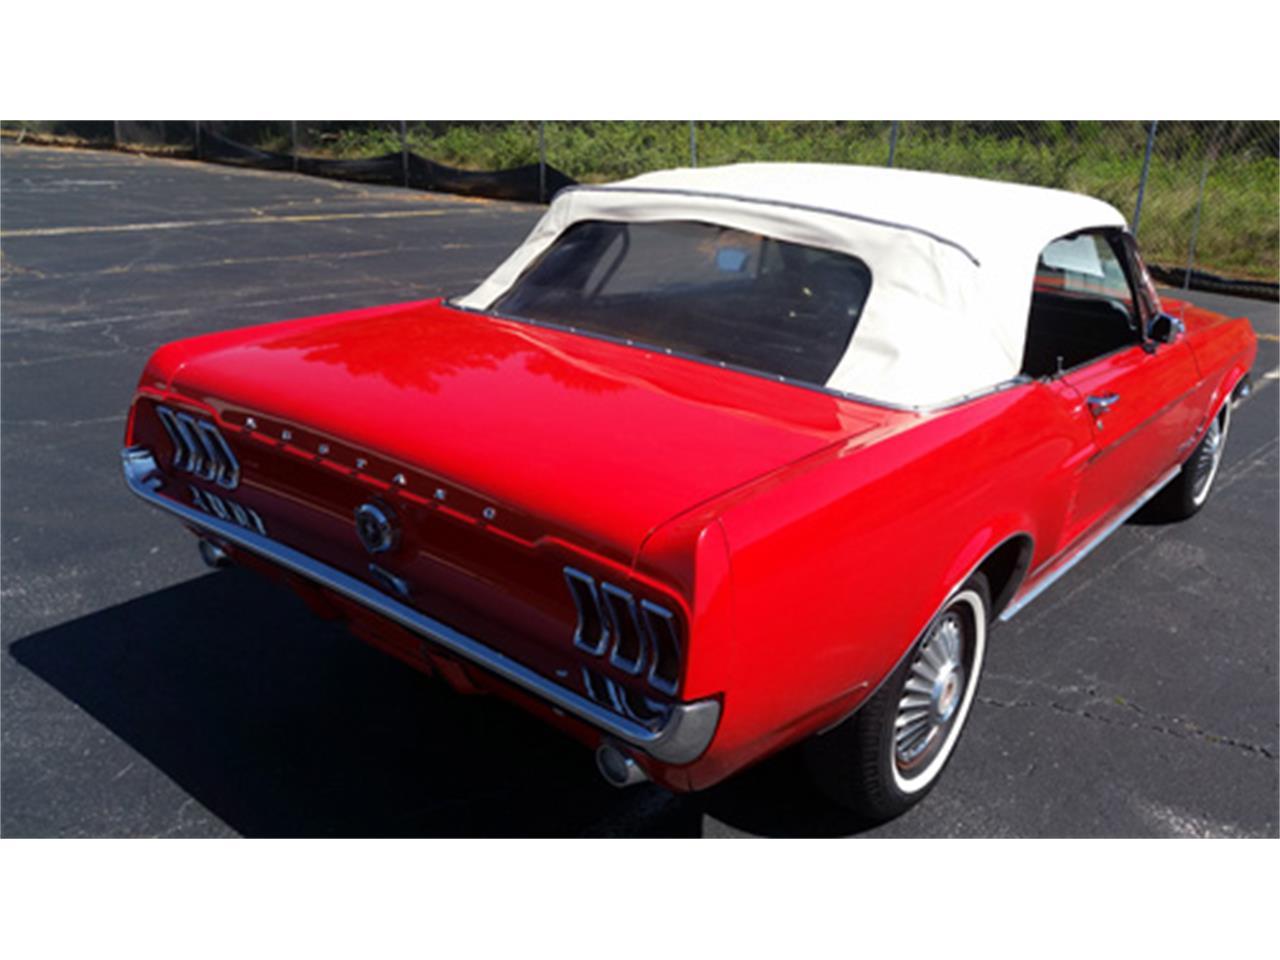 Ford Mustang V8 289 1967 dissier dispo prix tout compris